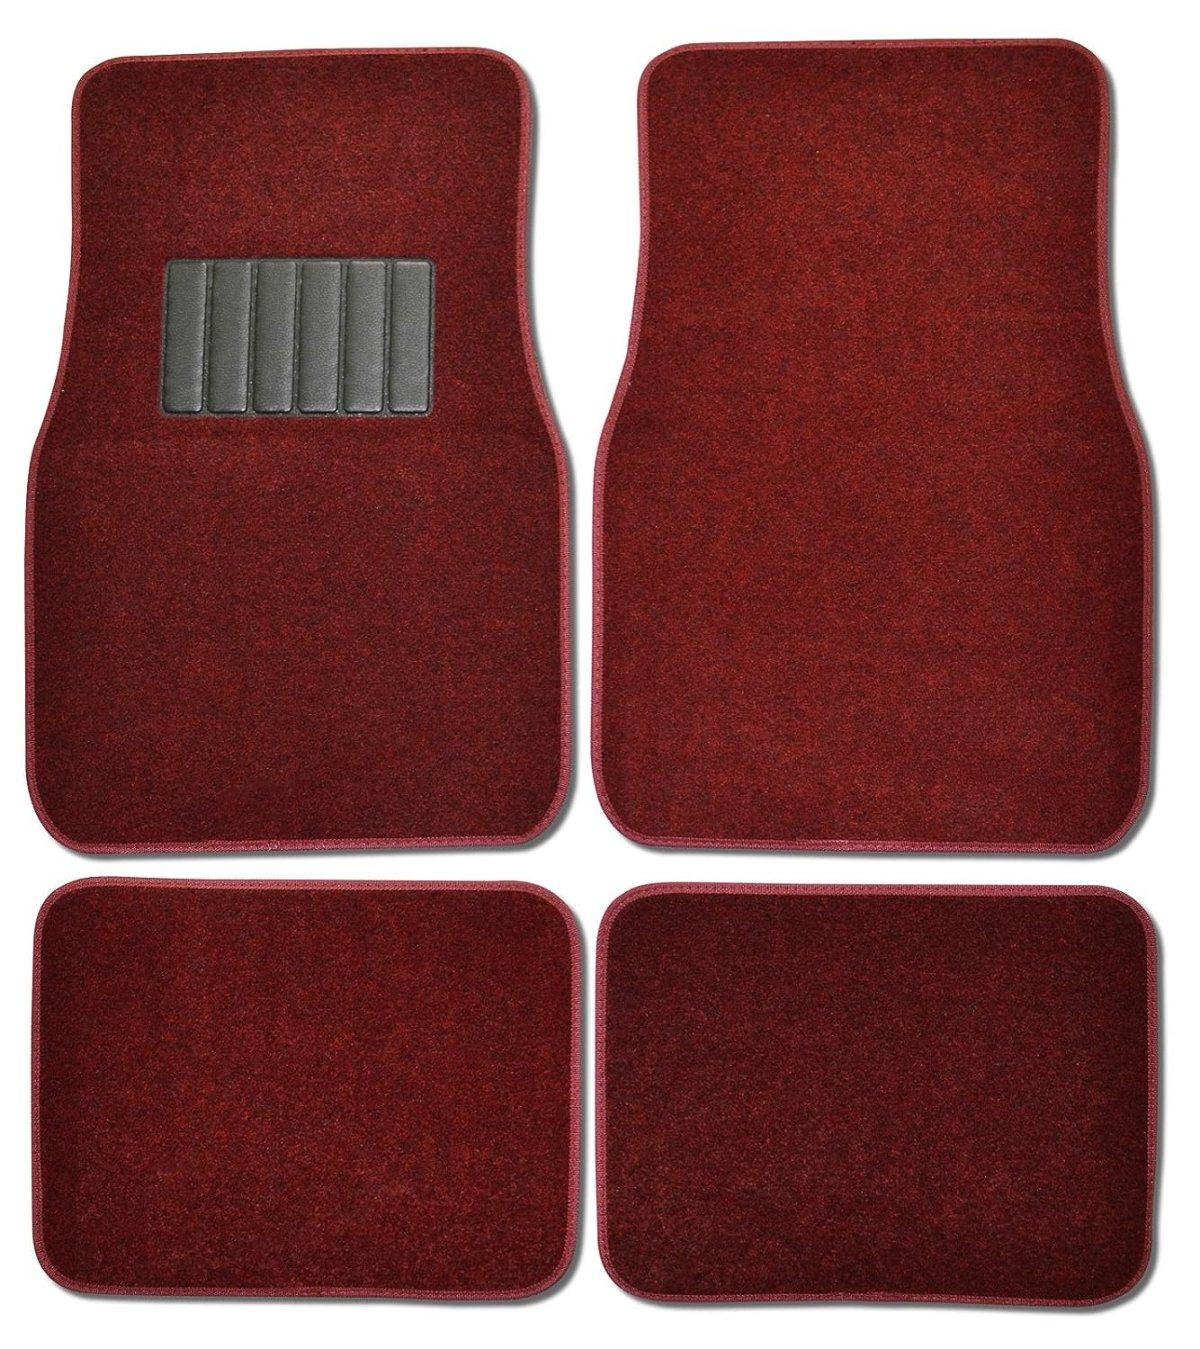 Best Floor Mats Reviews BDK MT-100-BD Burgundy Red Carpeted 4 Piece Car SUV Floor Mats With Vinyl Heel Pad Car Vehicle Universal Fit